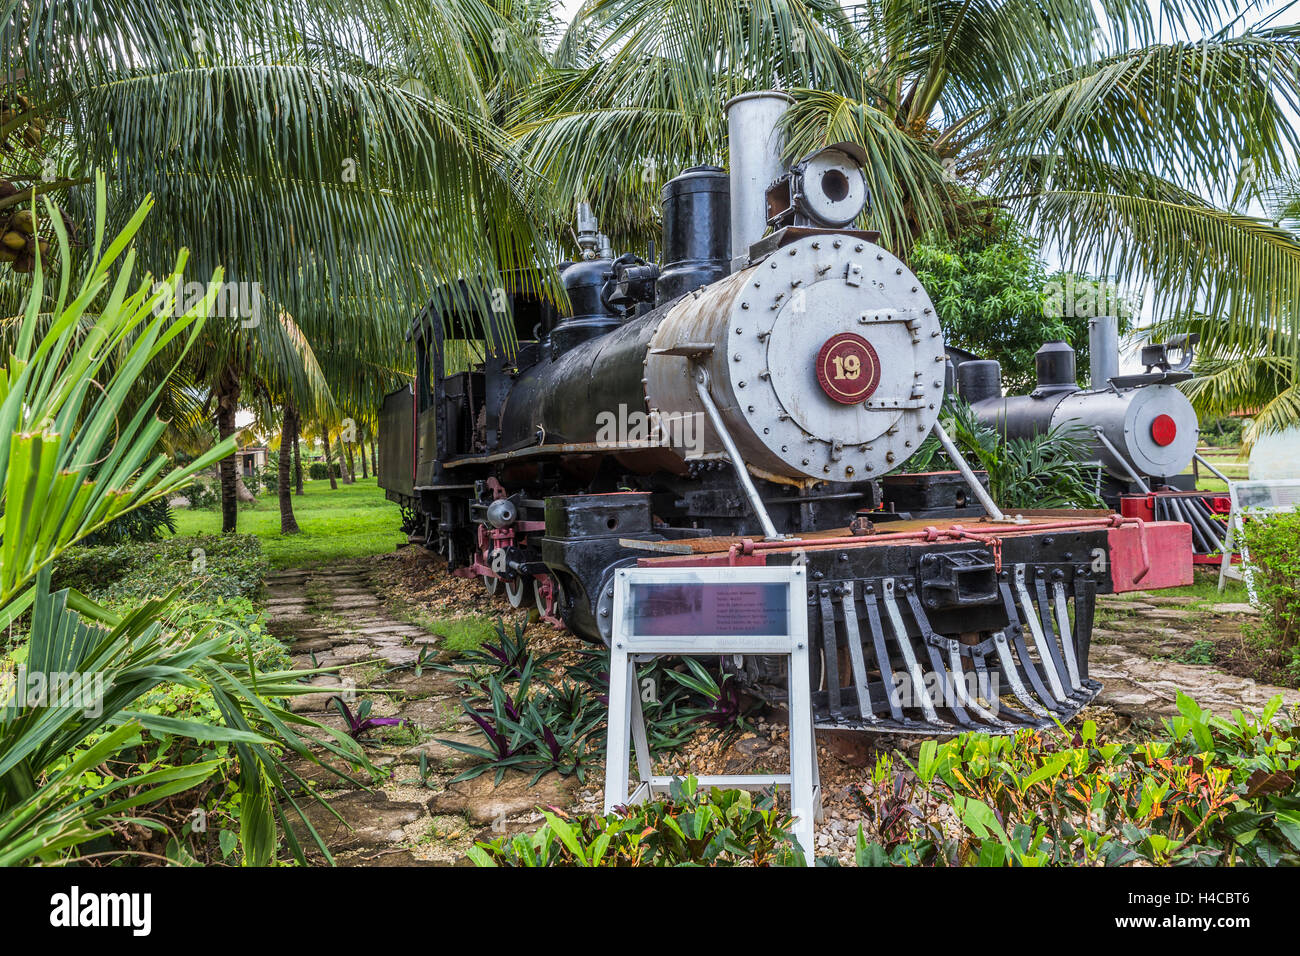 Historical steam locomotives exhibit and nostalgic railway on the area the sugar museum Marcelo Salado, Caibarién, - Stock Image